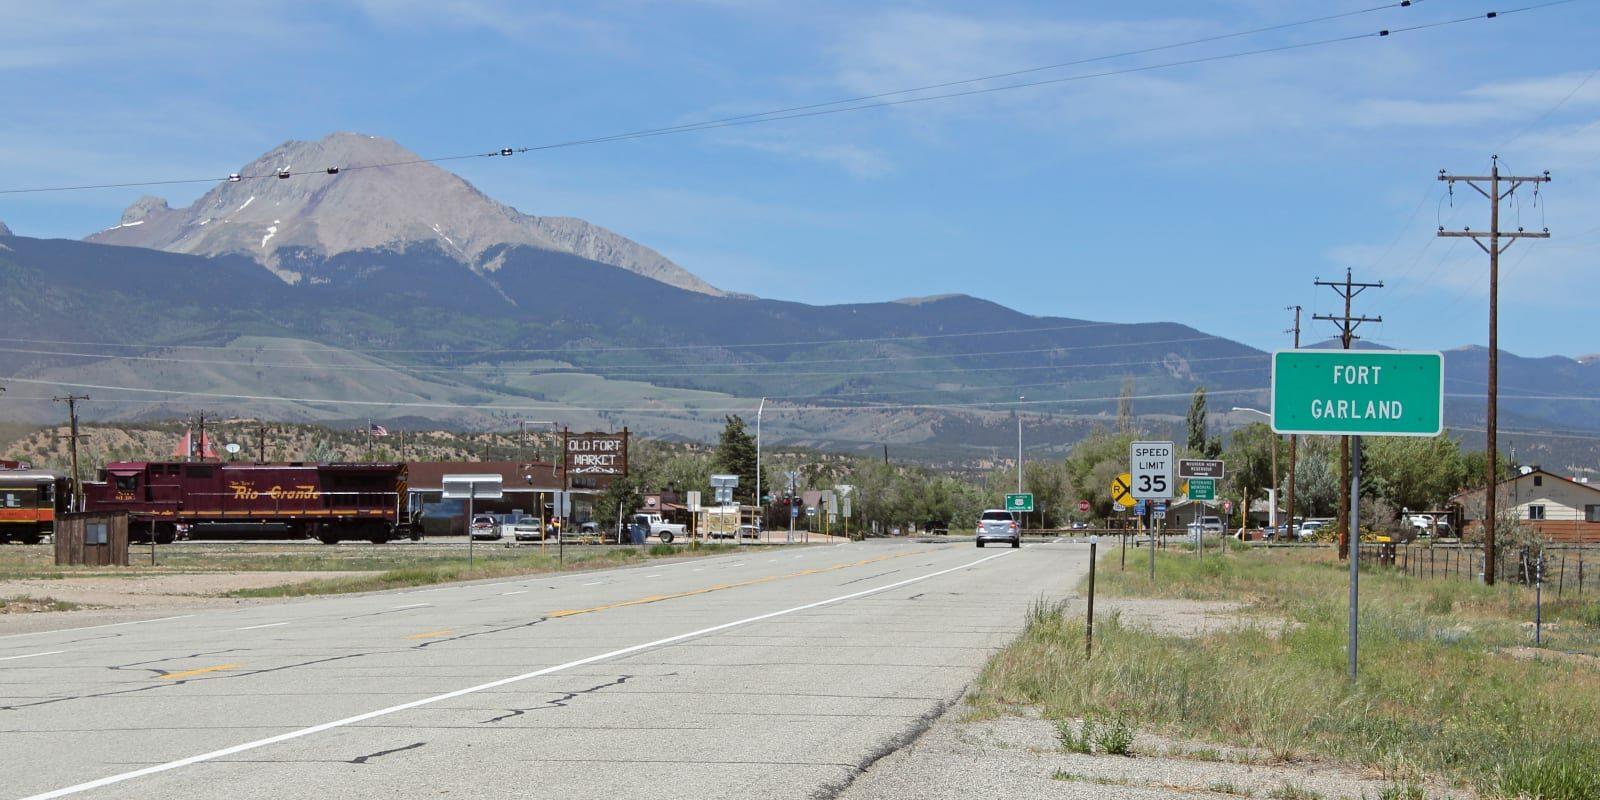 Fort Garland Colorado Mount Lindsey